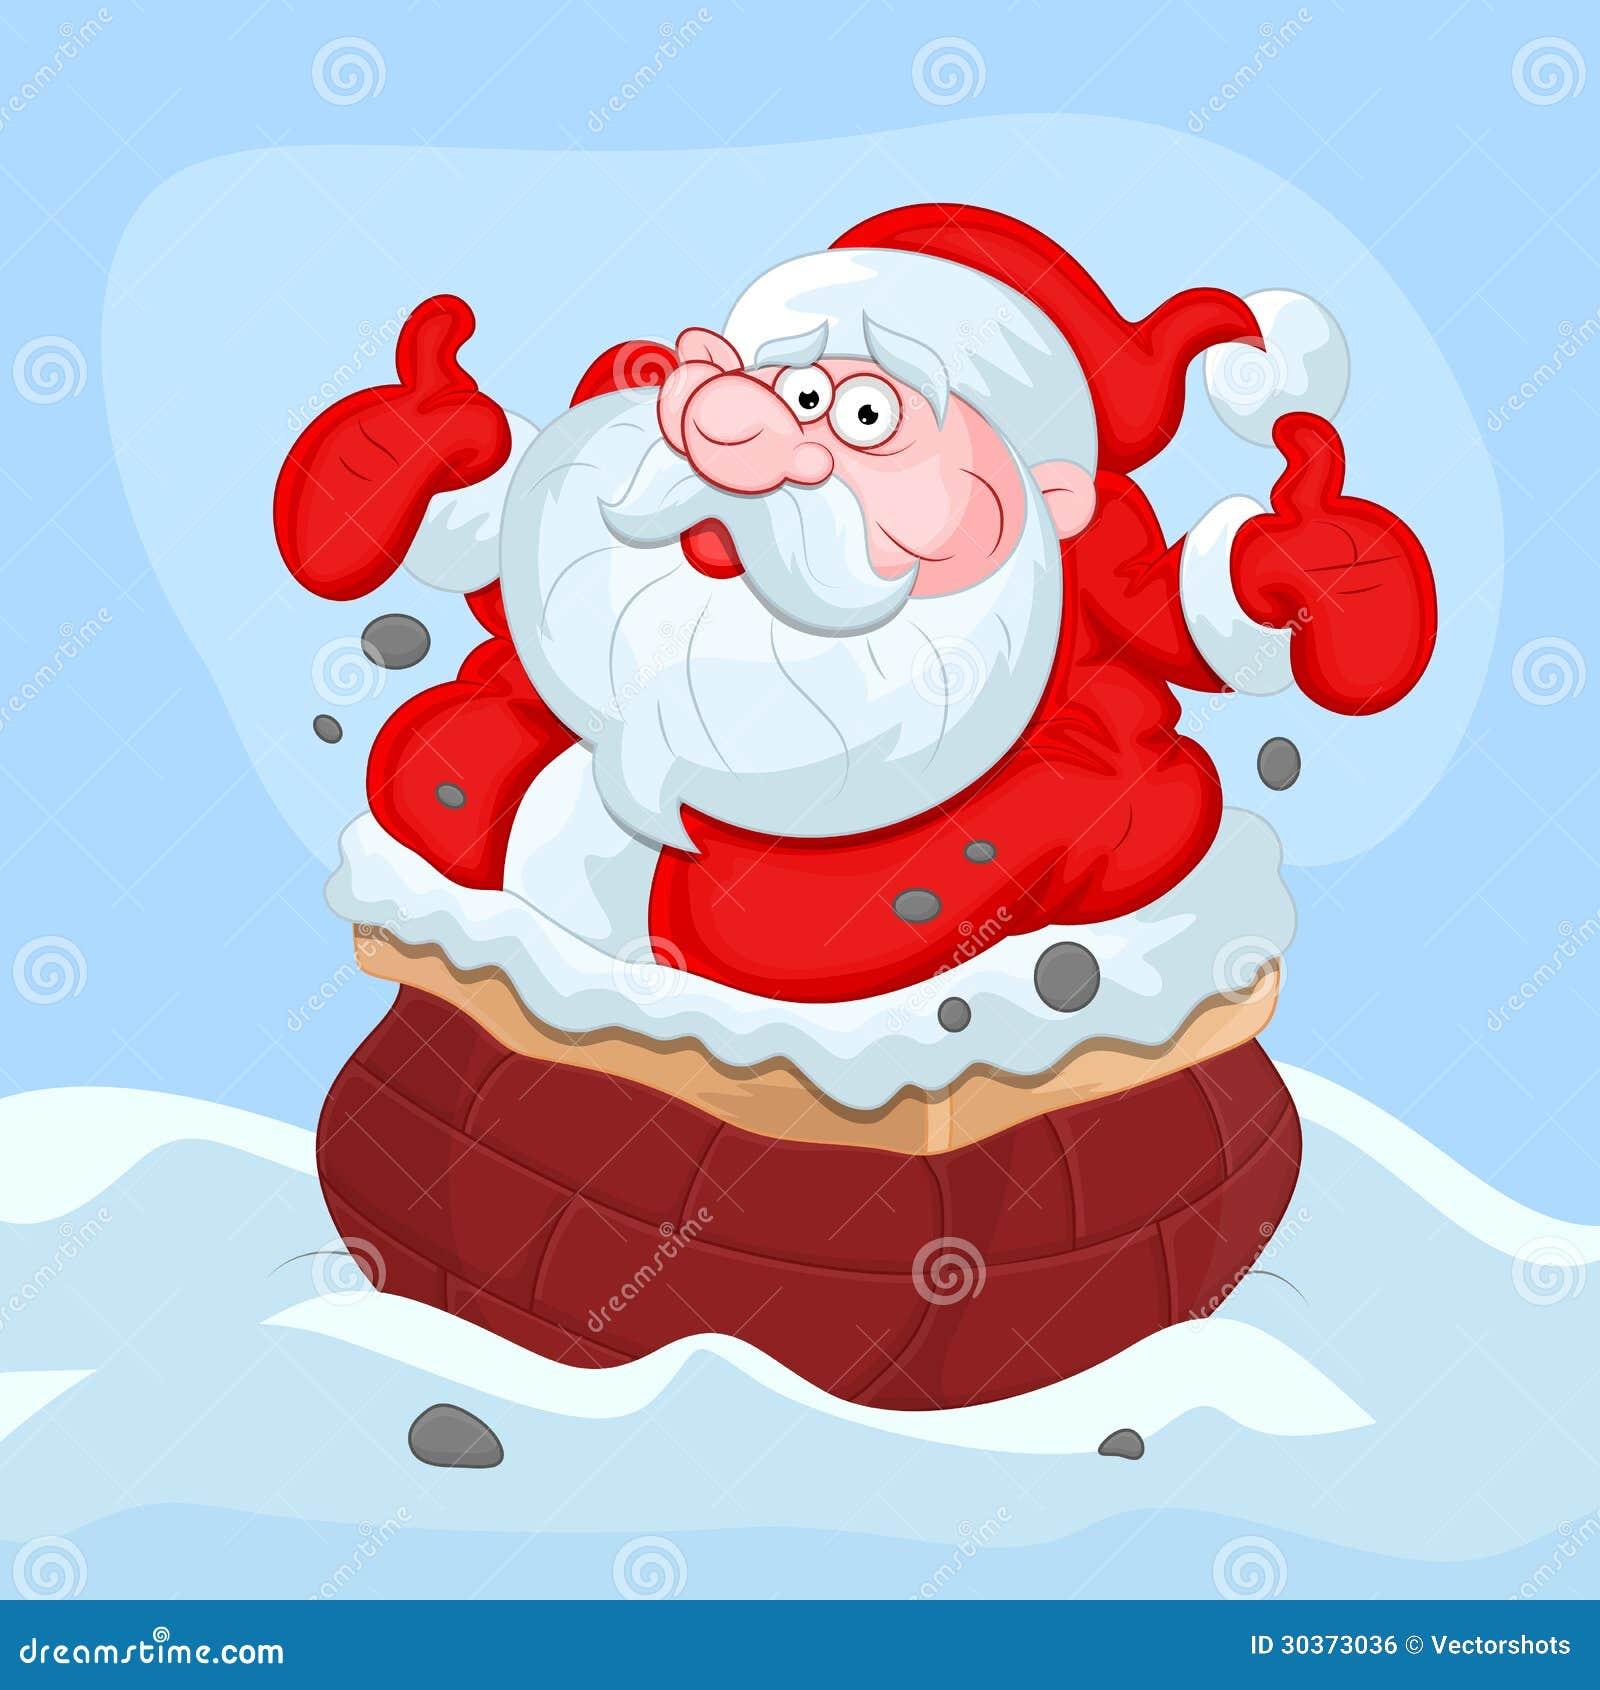 Cartoon Santa Claus - Christmas Vector Illustration ...